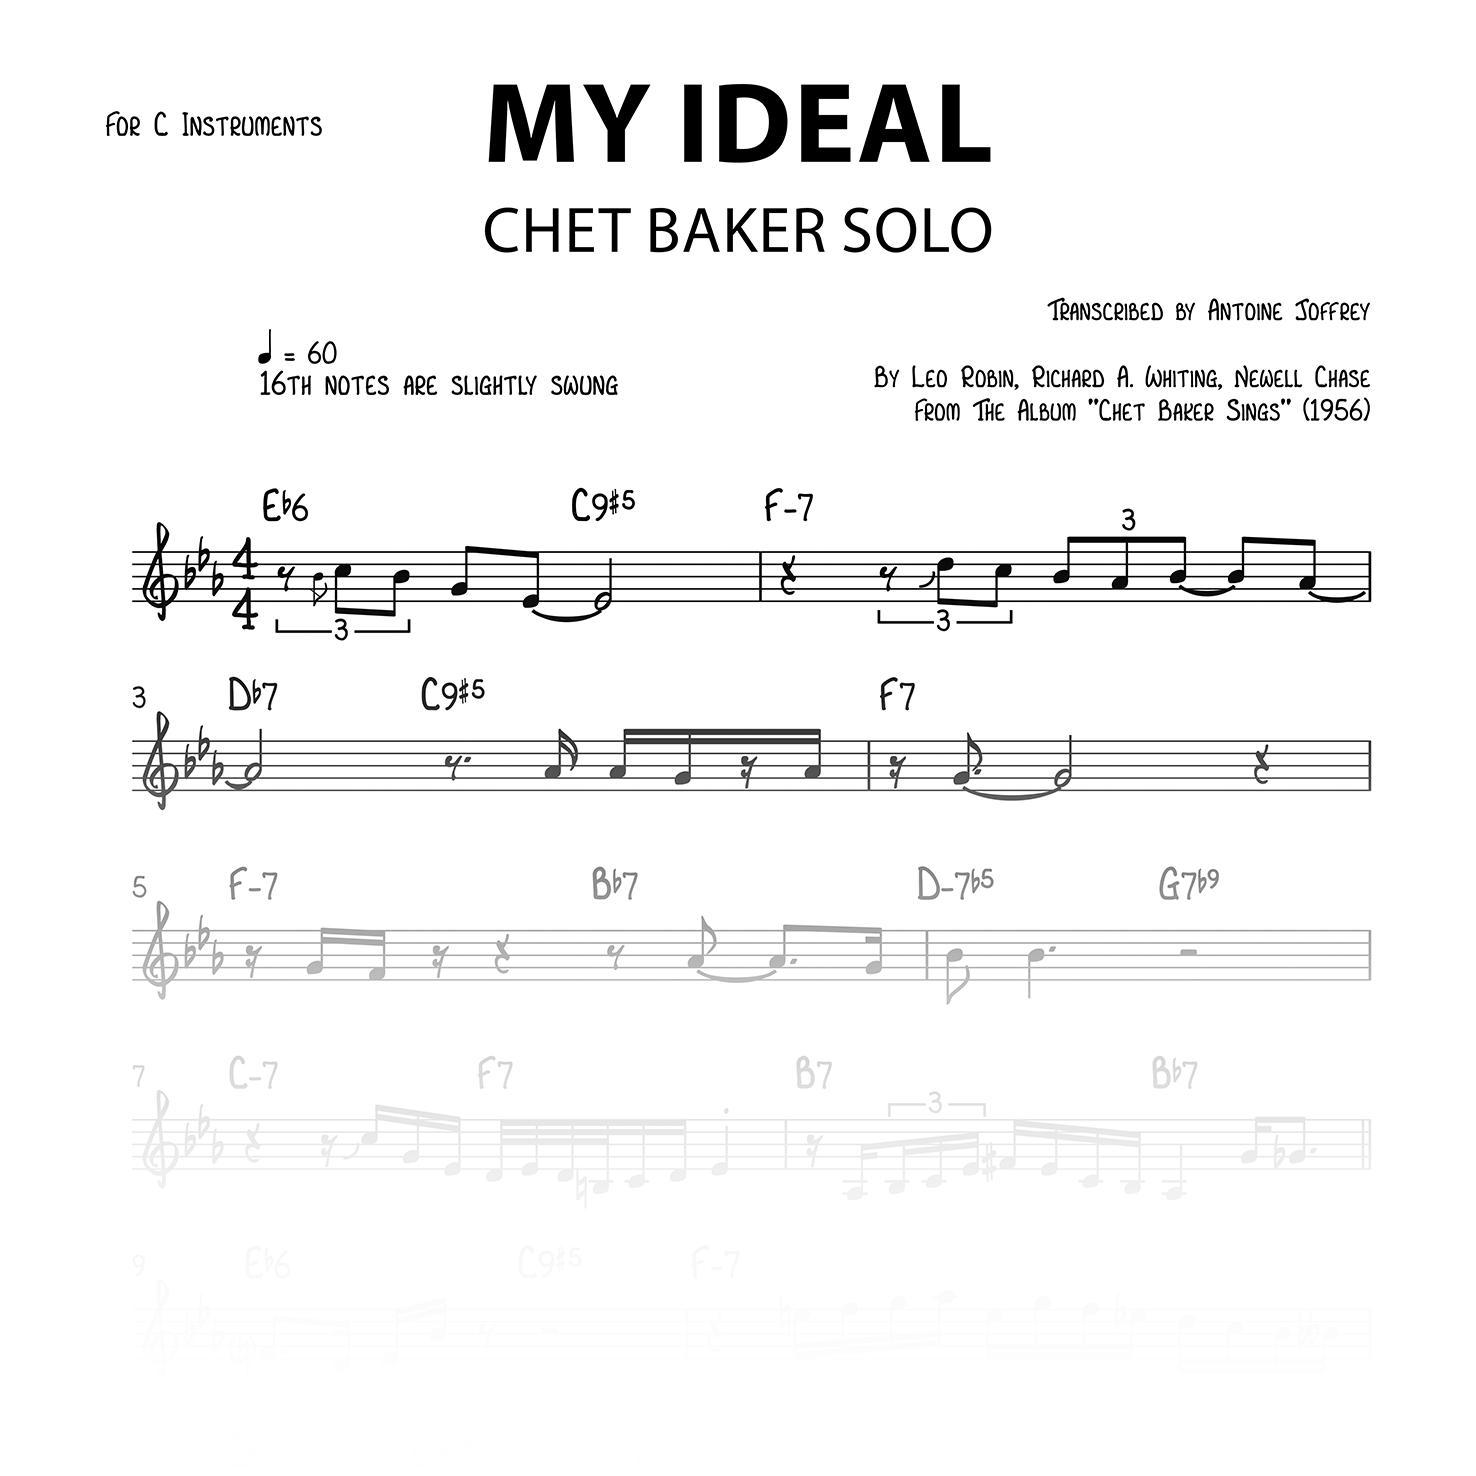 My Ideal - Chet Baker solo